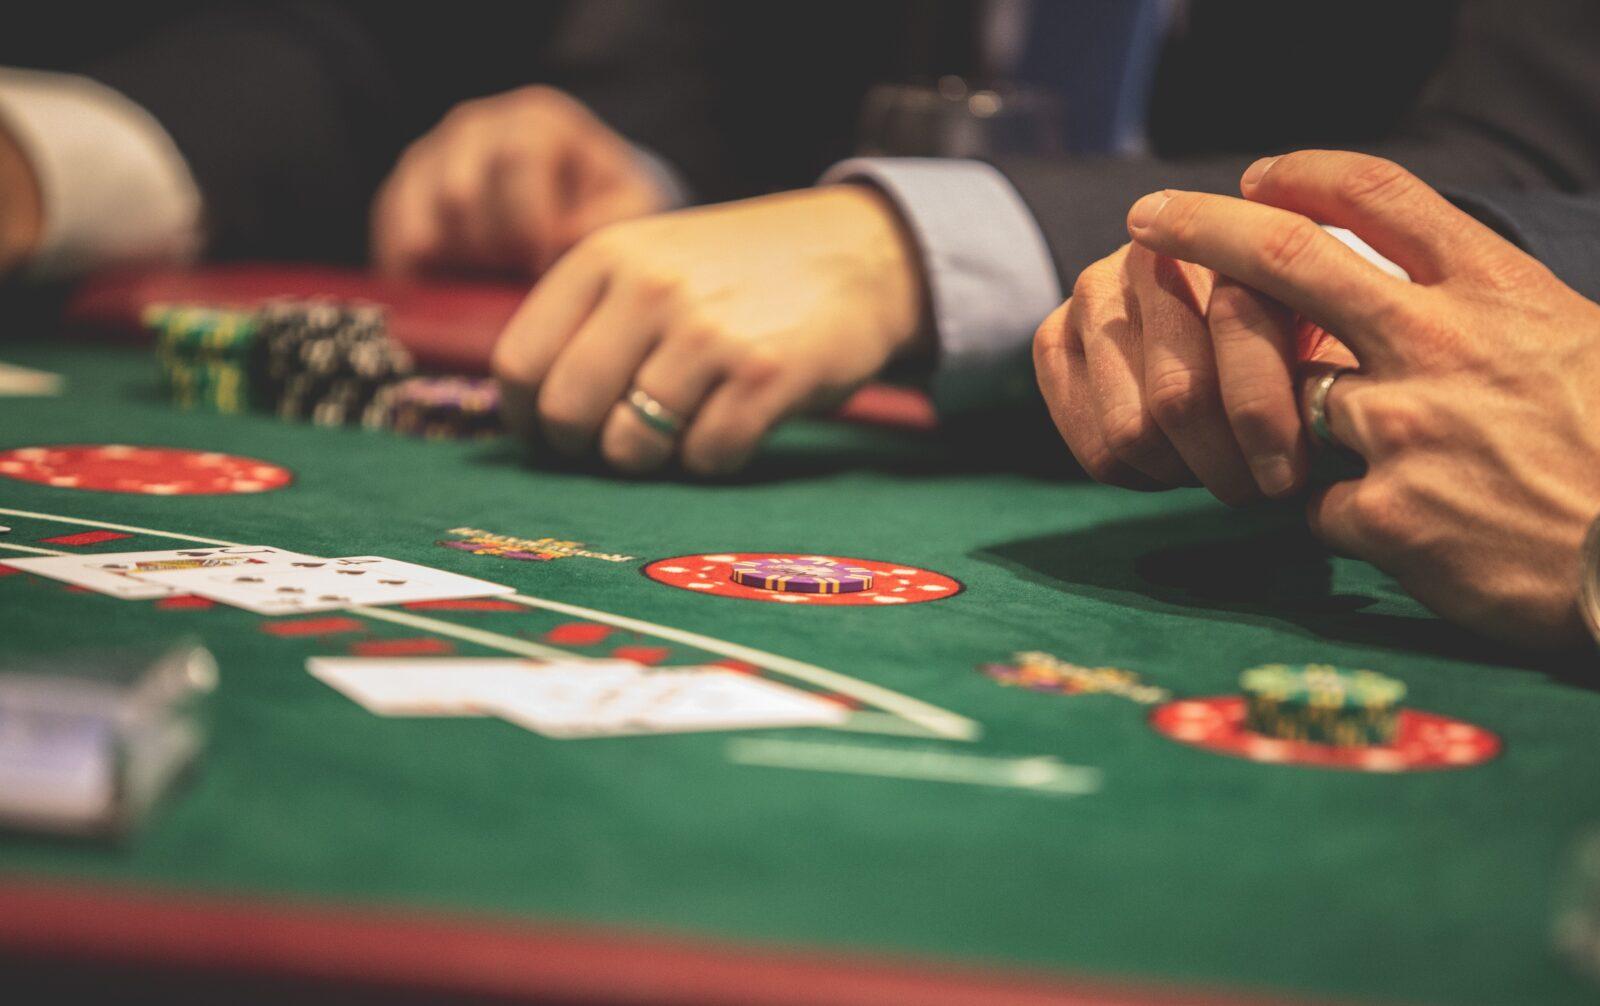 Risk taker is a gamble